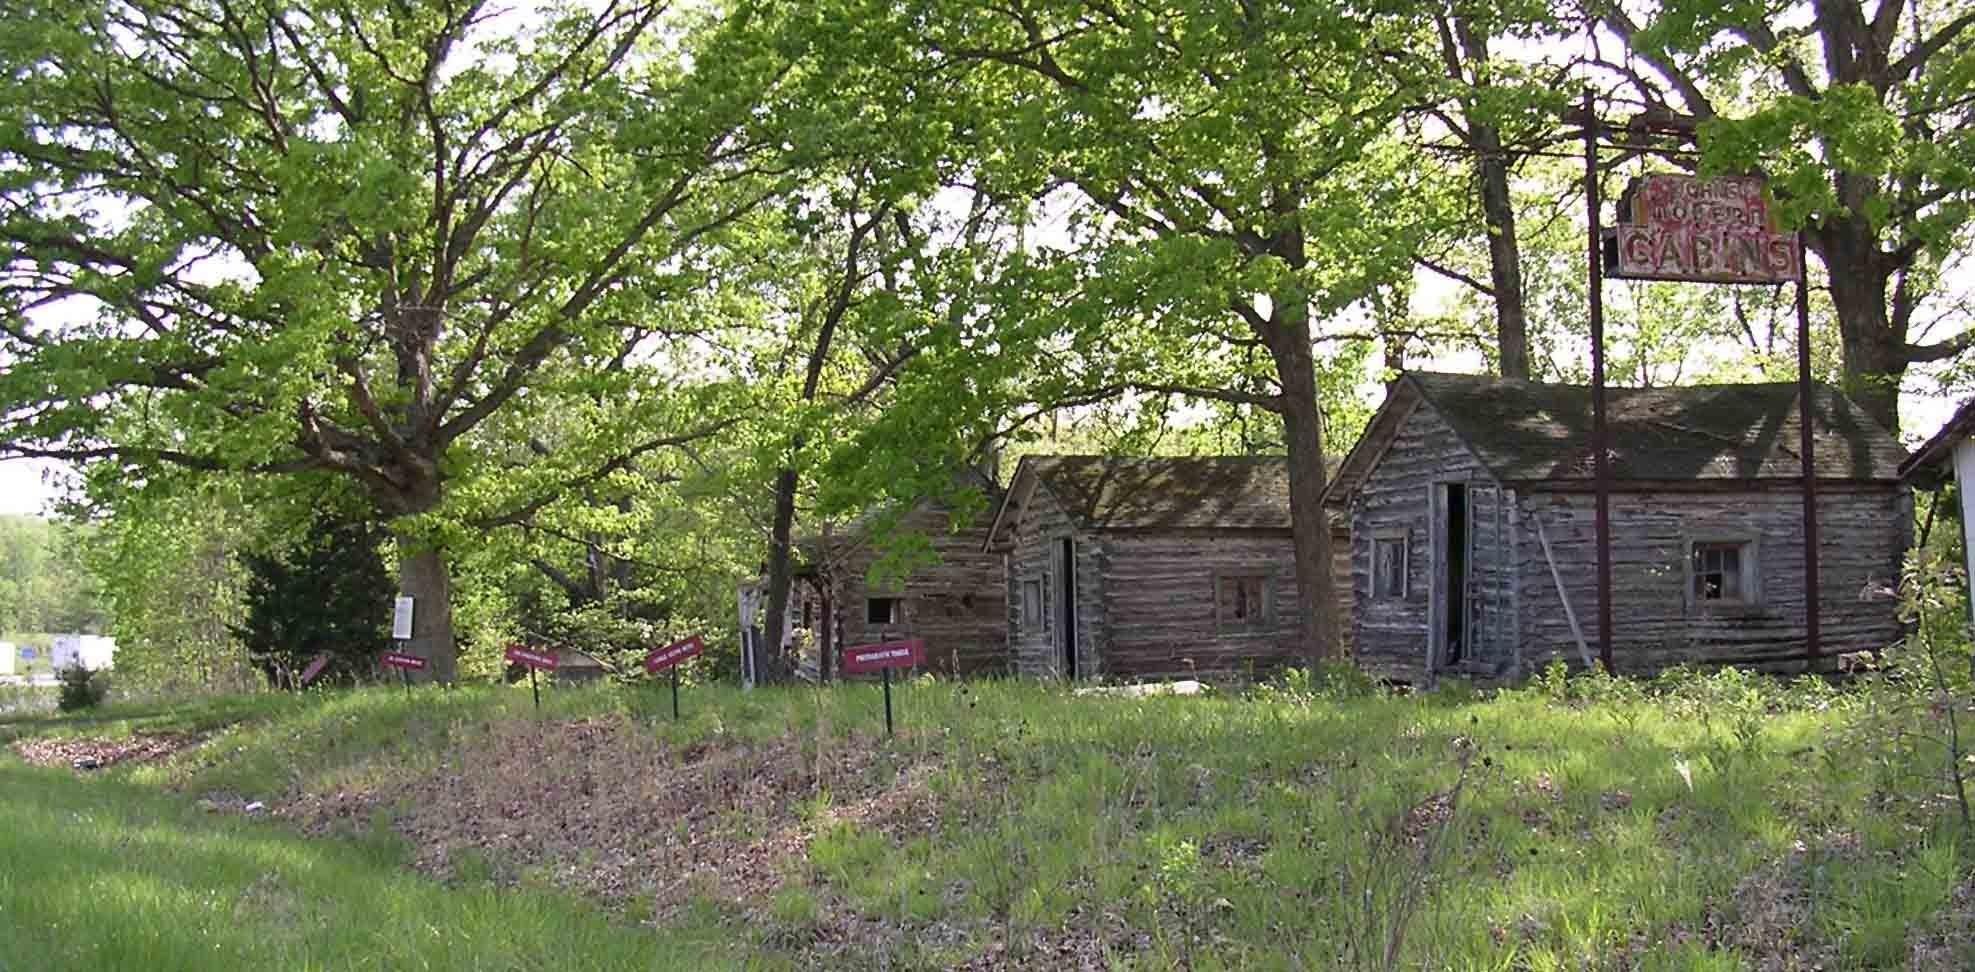 Missouri john s modern cabins west of arlington missouri abandoned